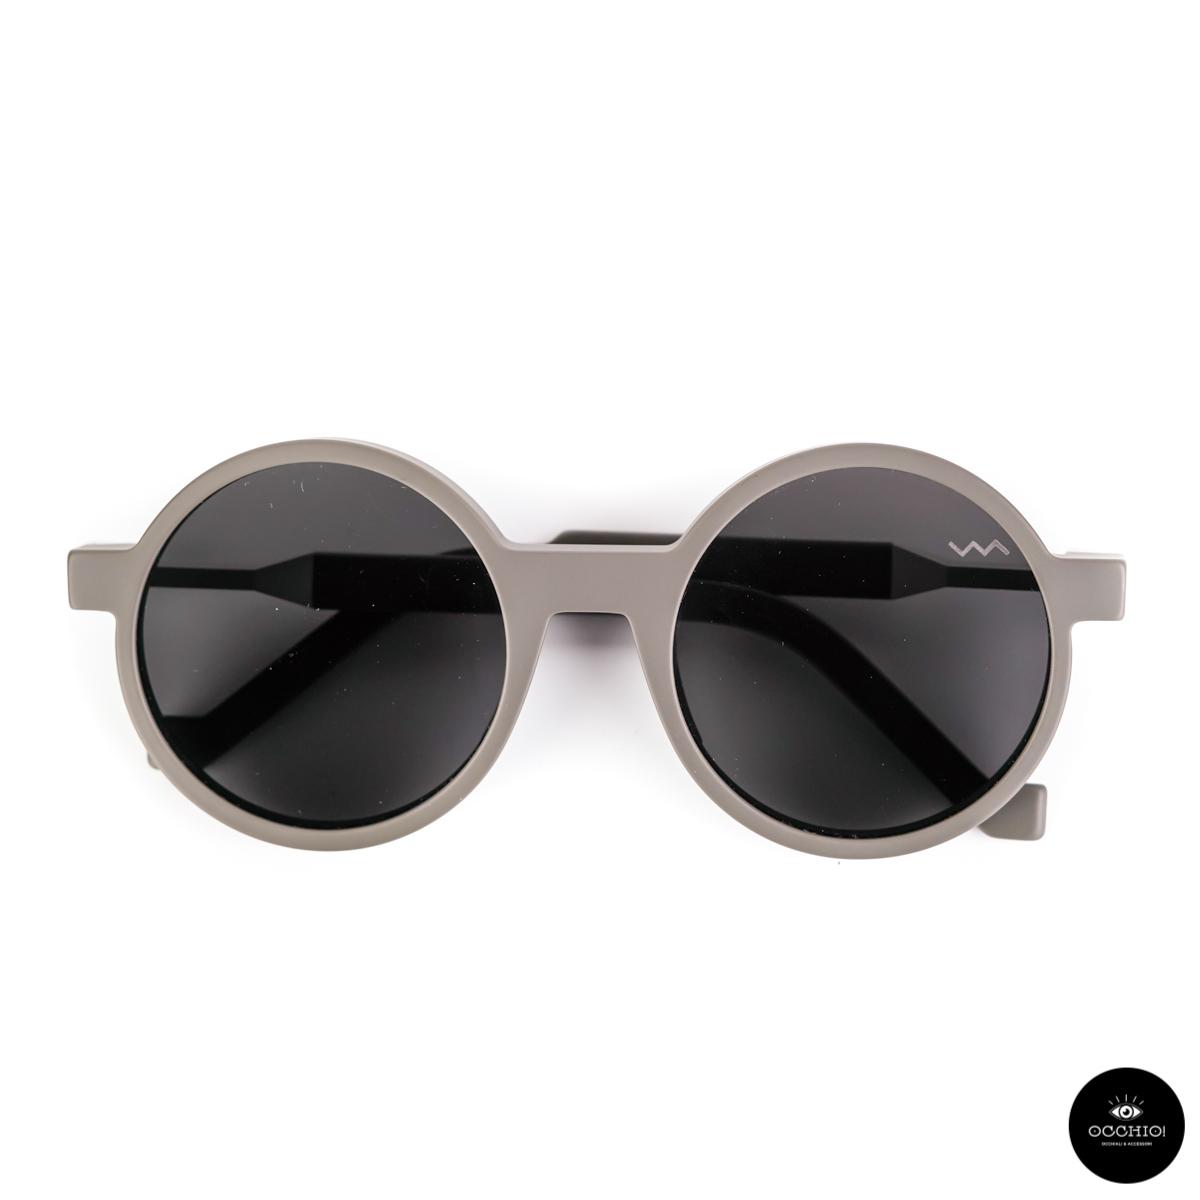 VAVA eyewear WL0000 Dark Grey Matt